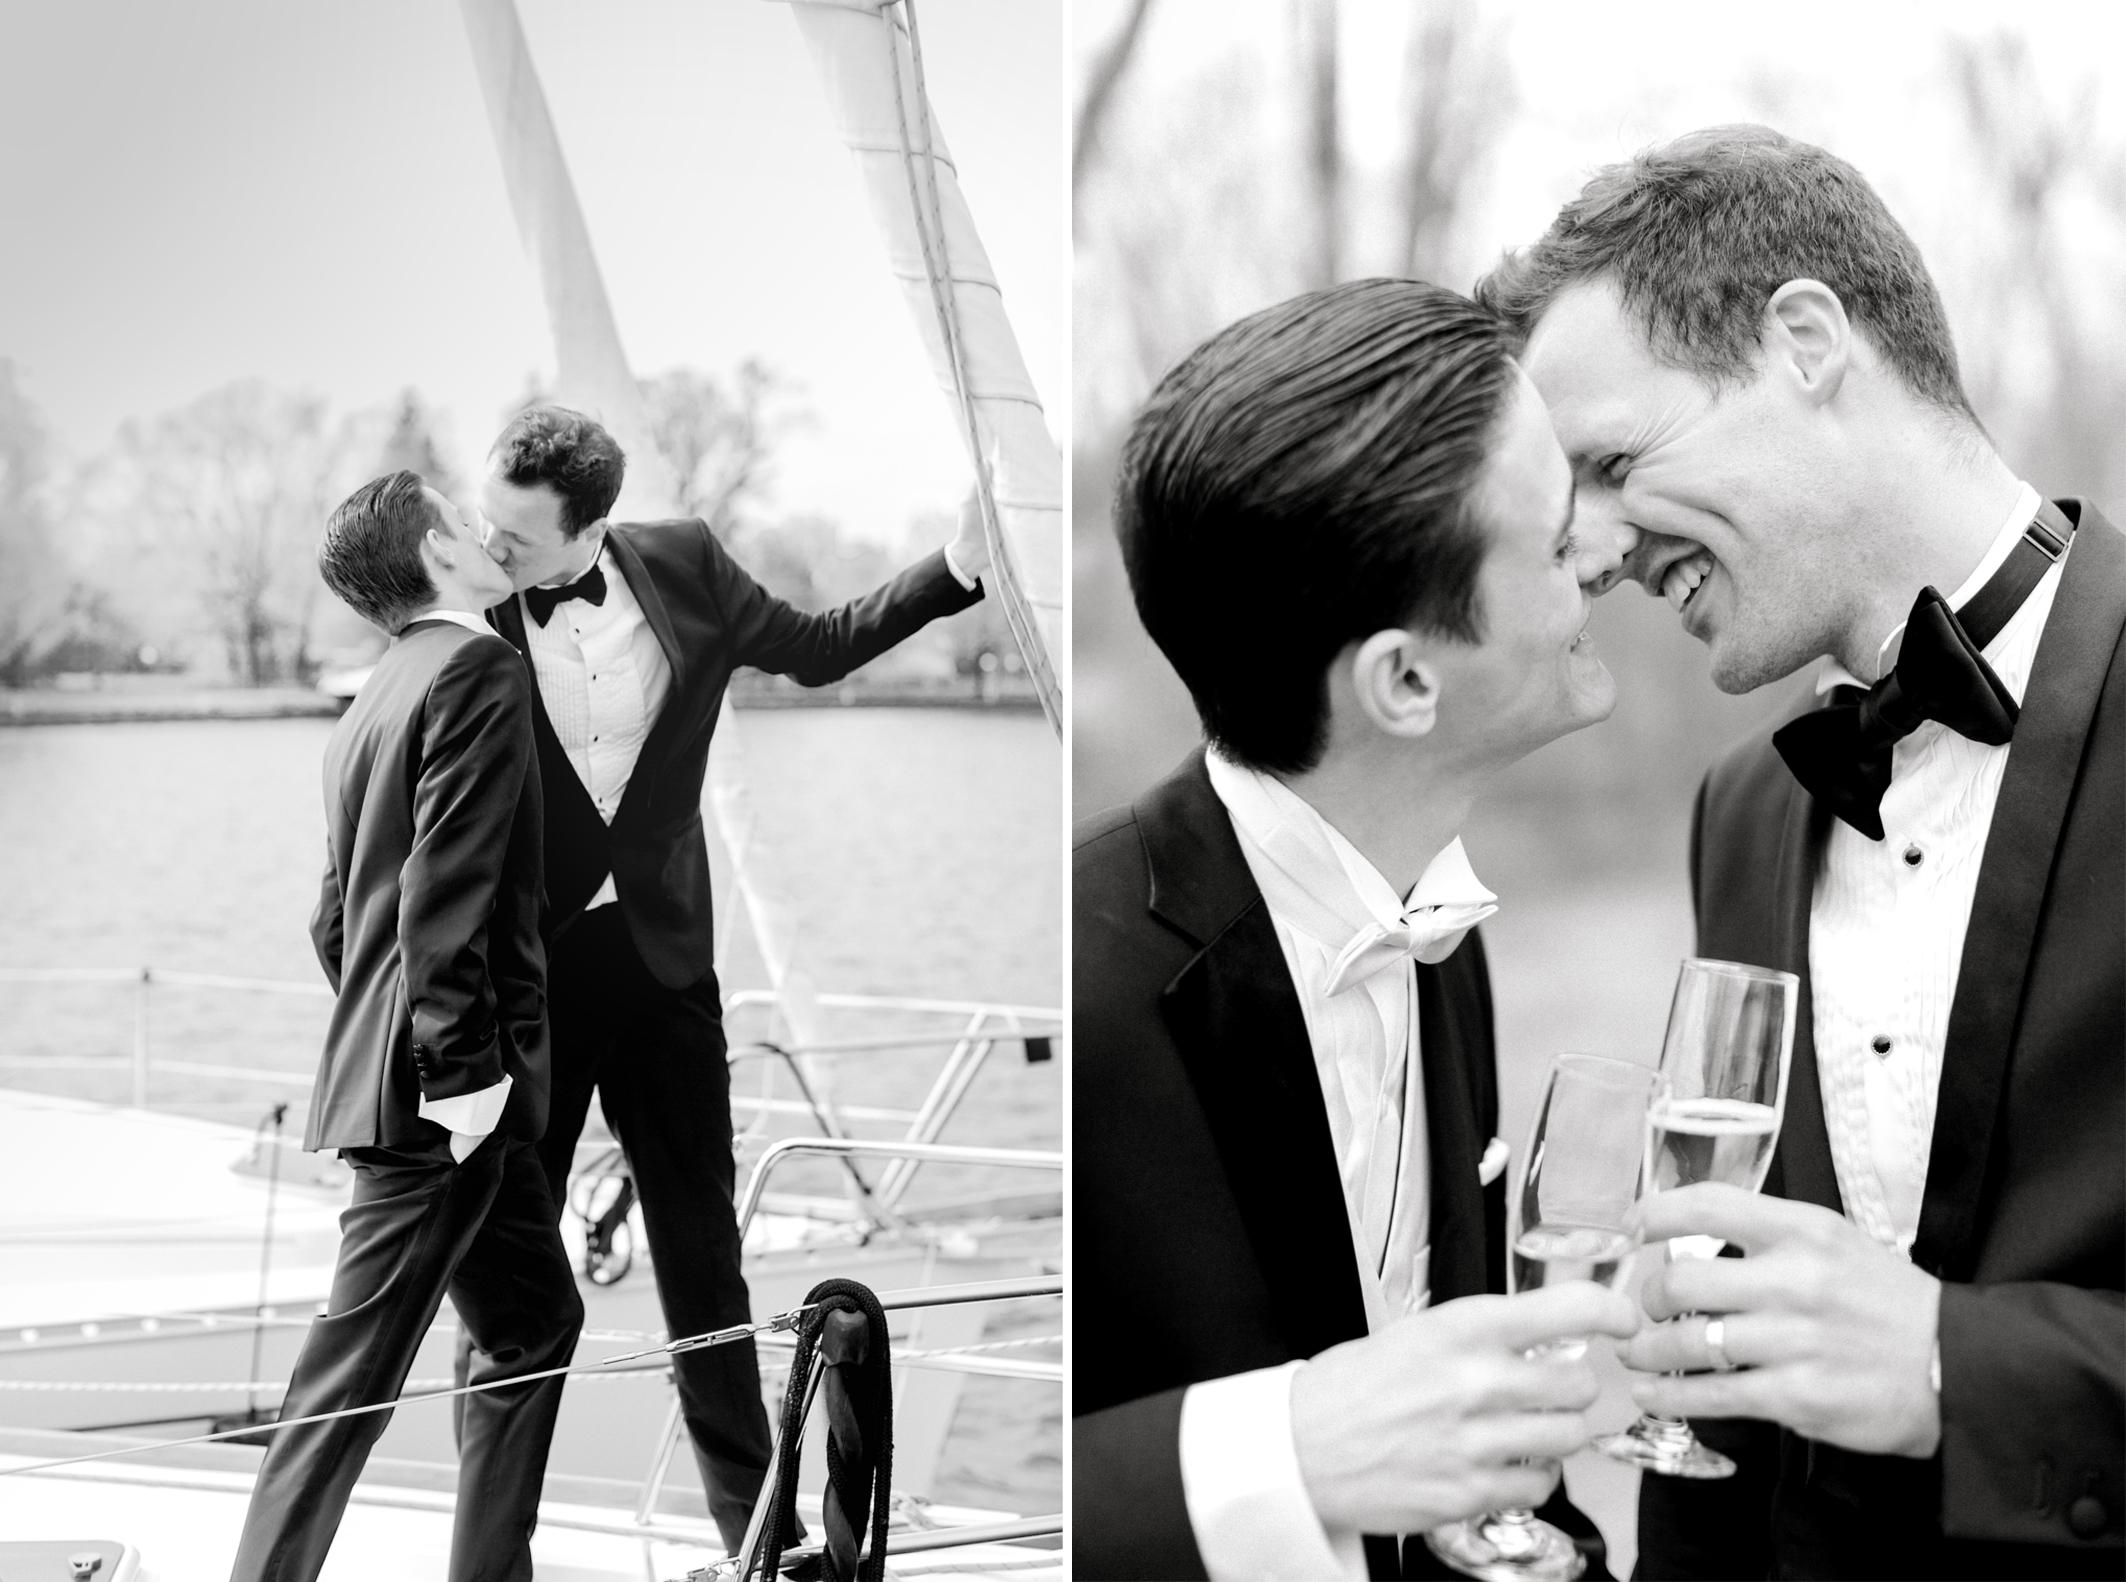 gay-wedding-toronto-wedding-toronto-photographer-langdon-richelle-hunter.jpg